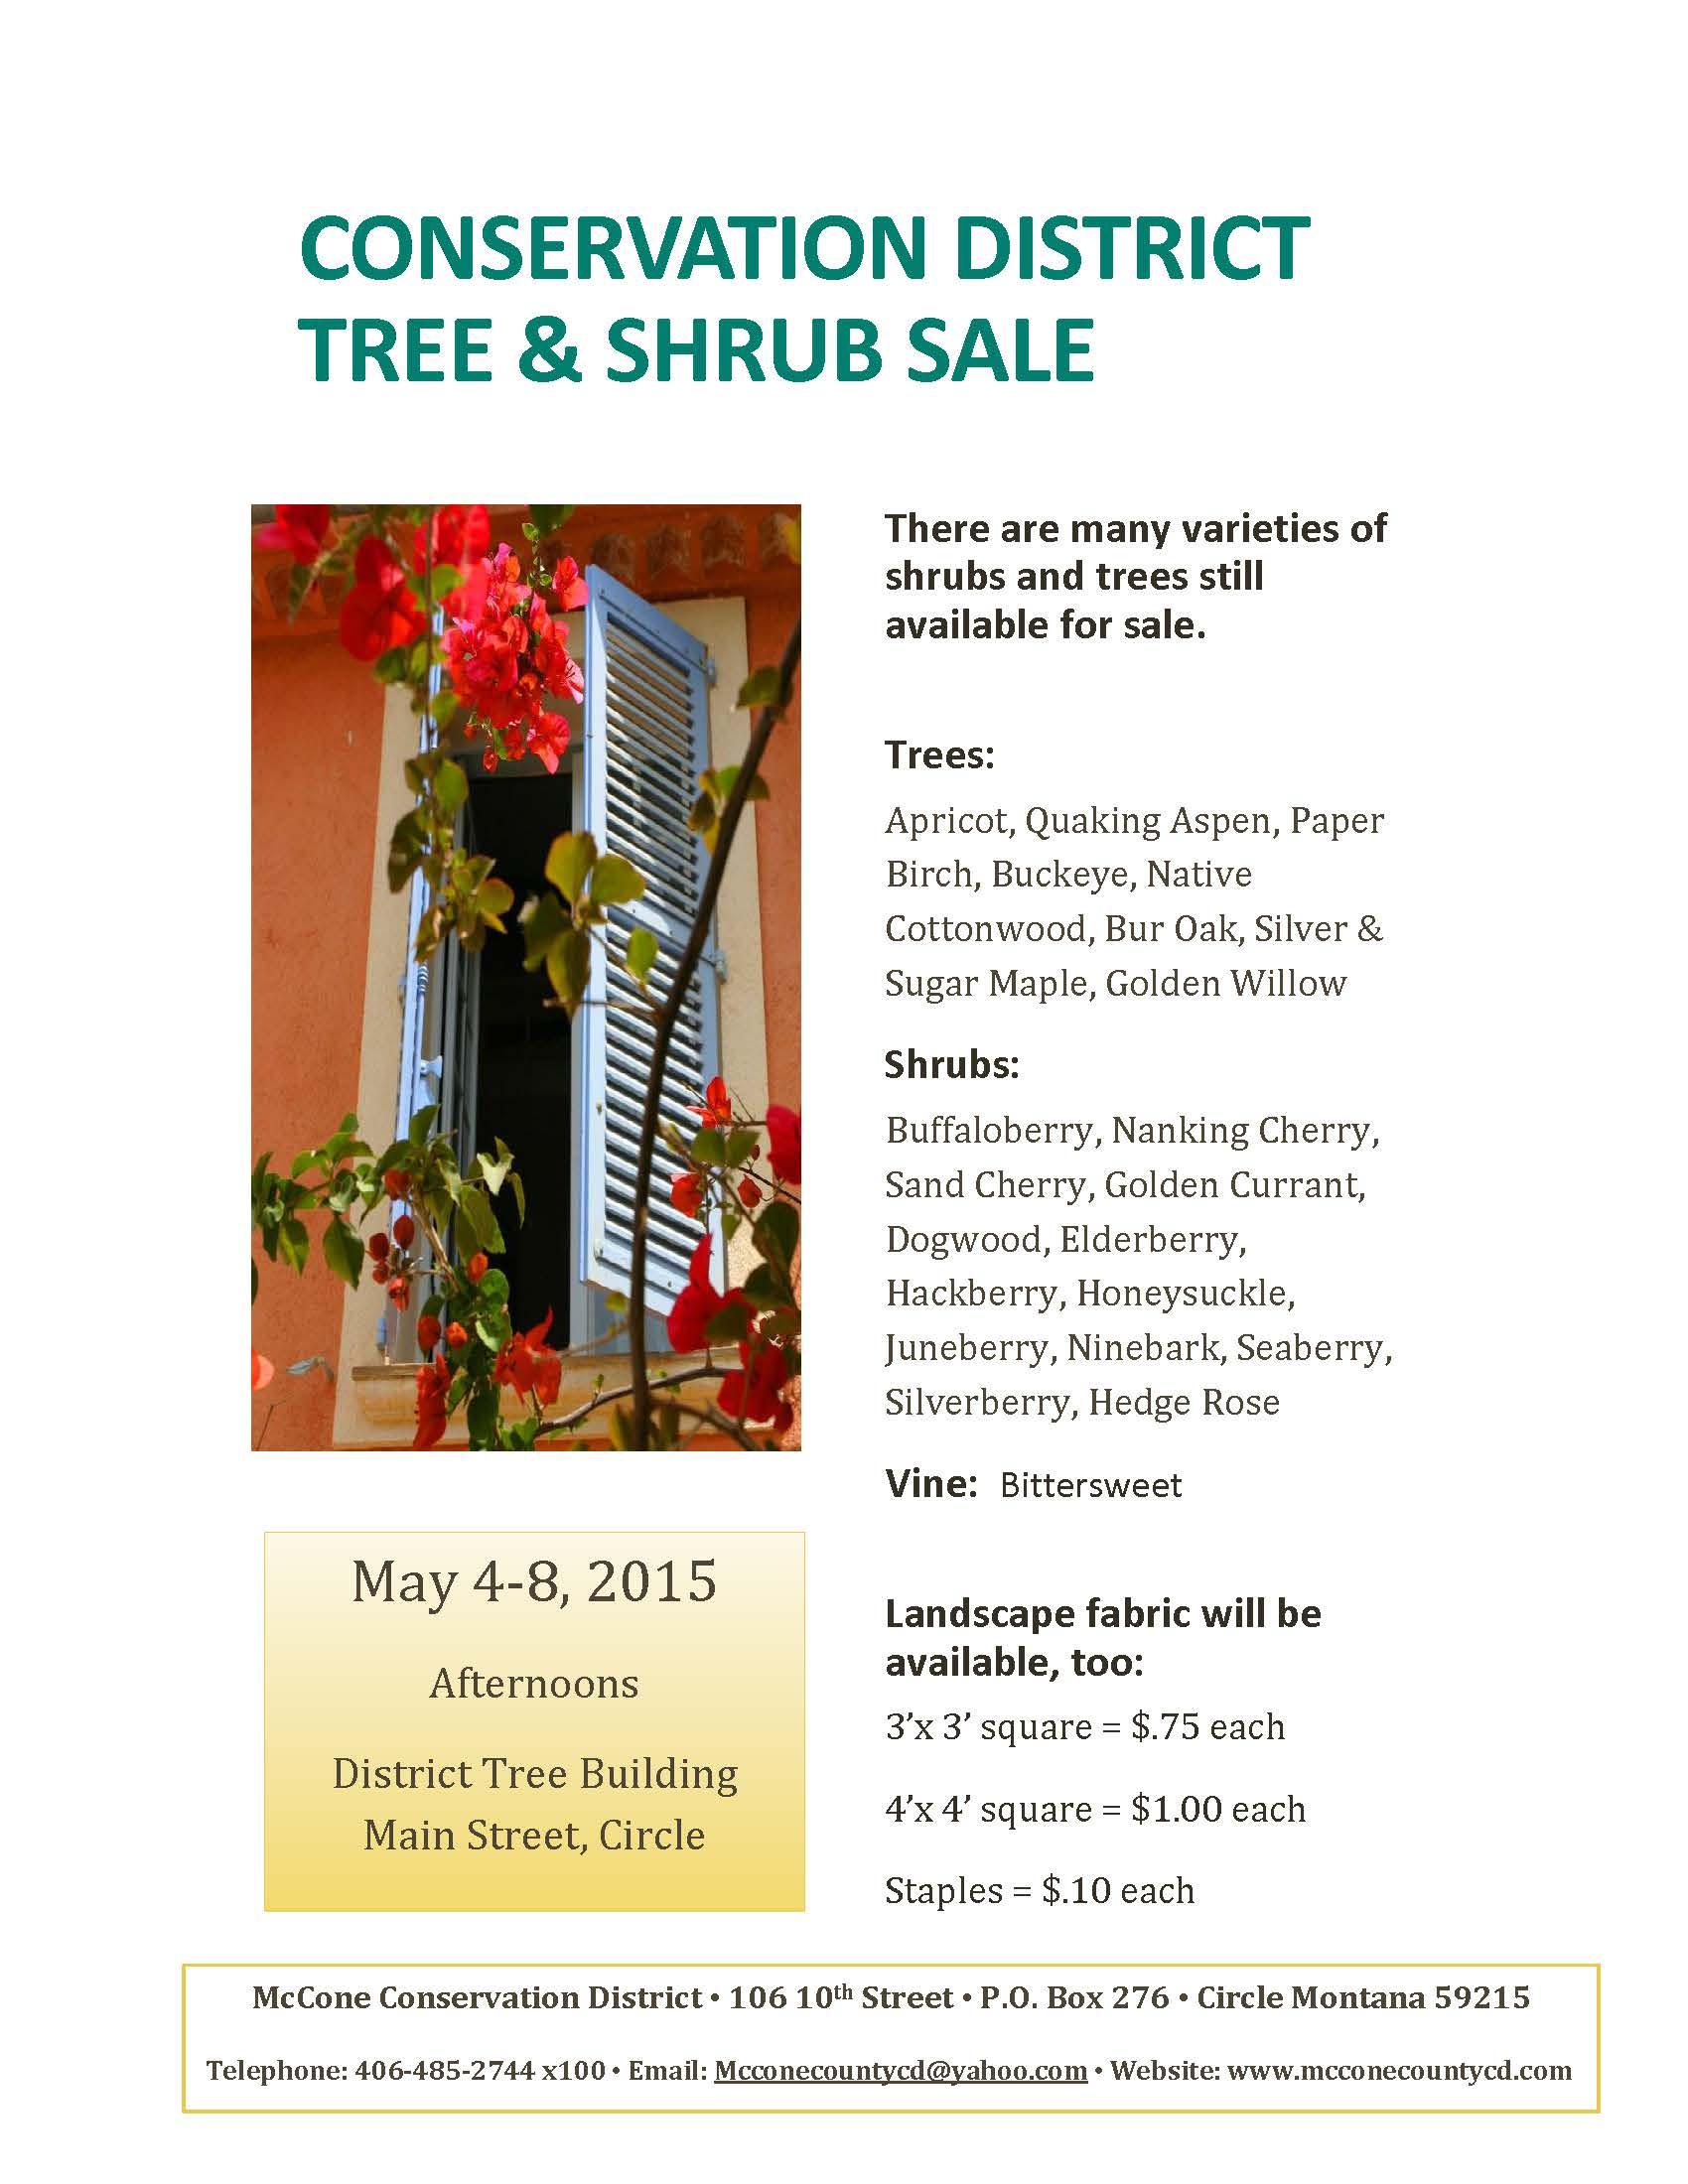 Montana mccone county circle - Tree Shrub Sale The Sequel